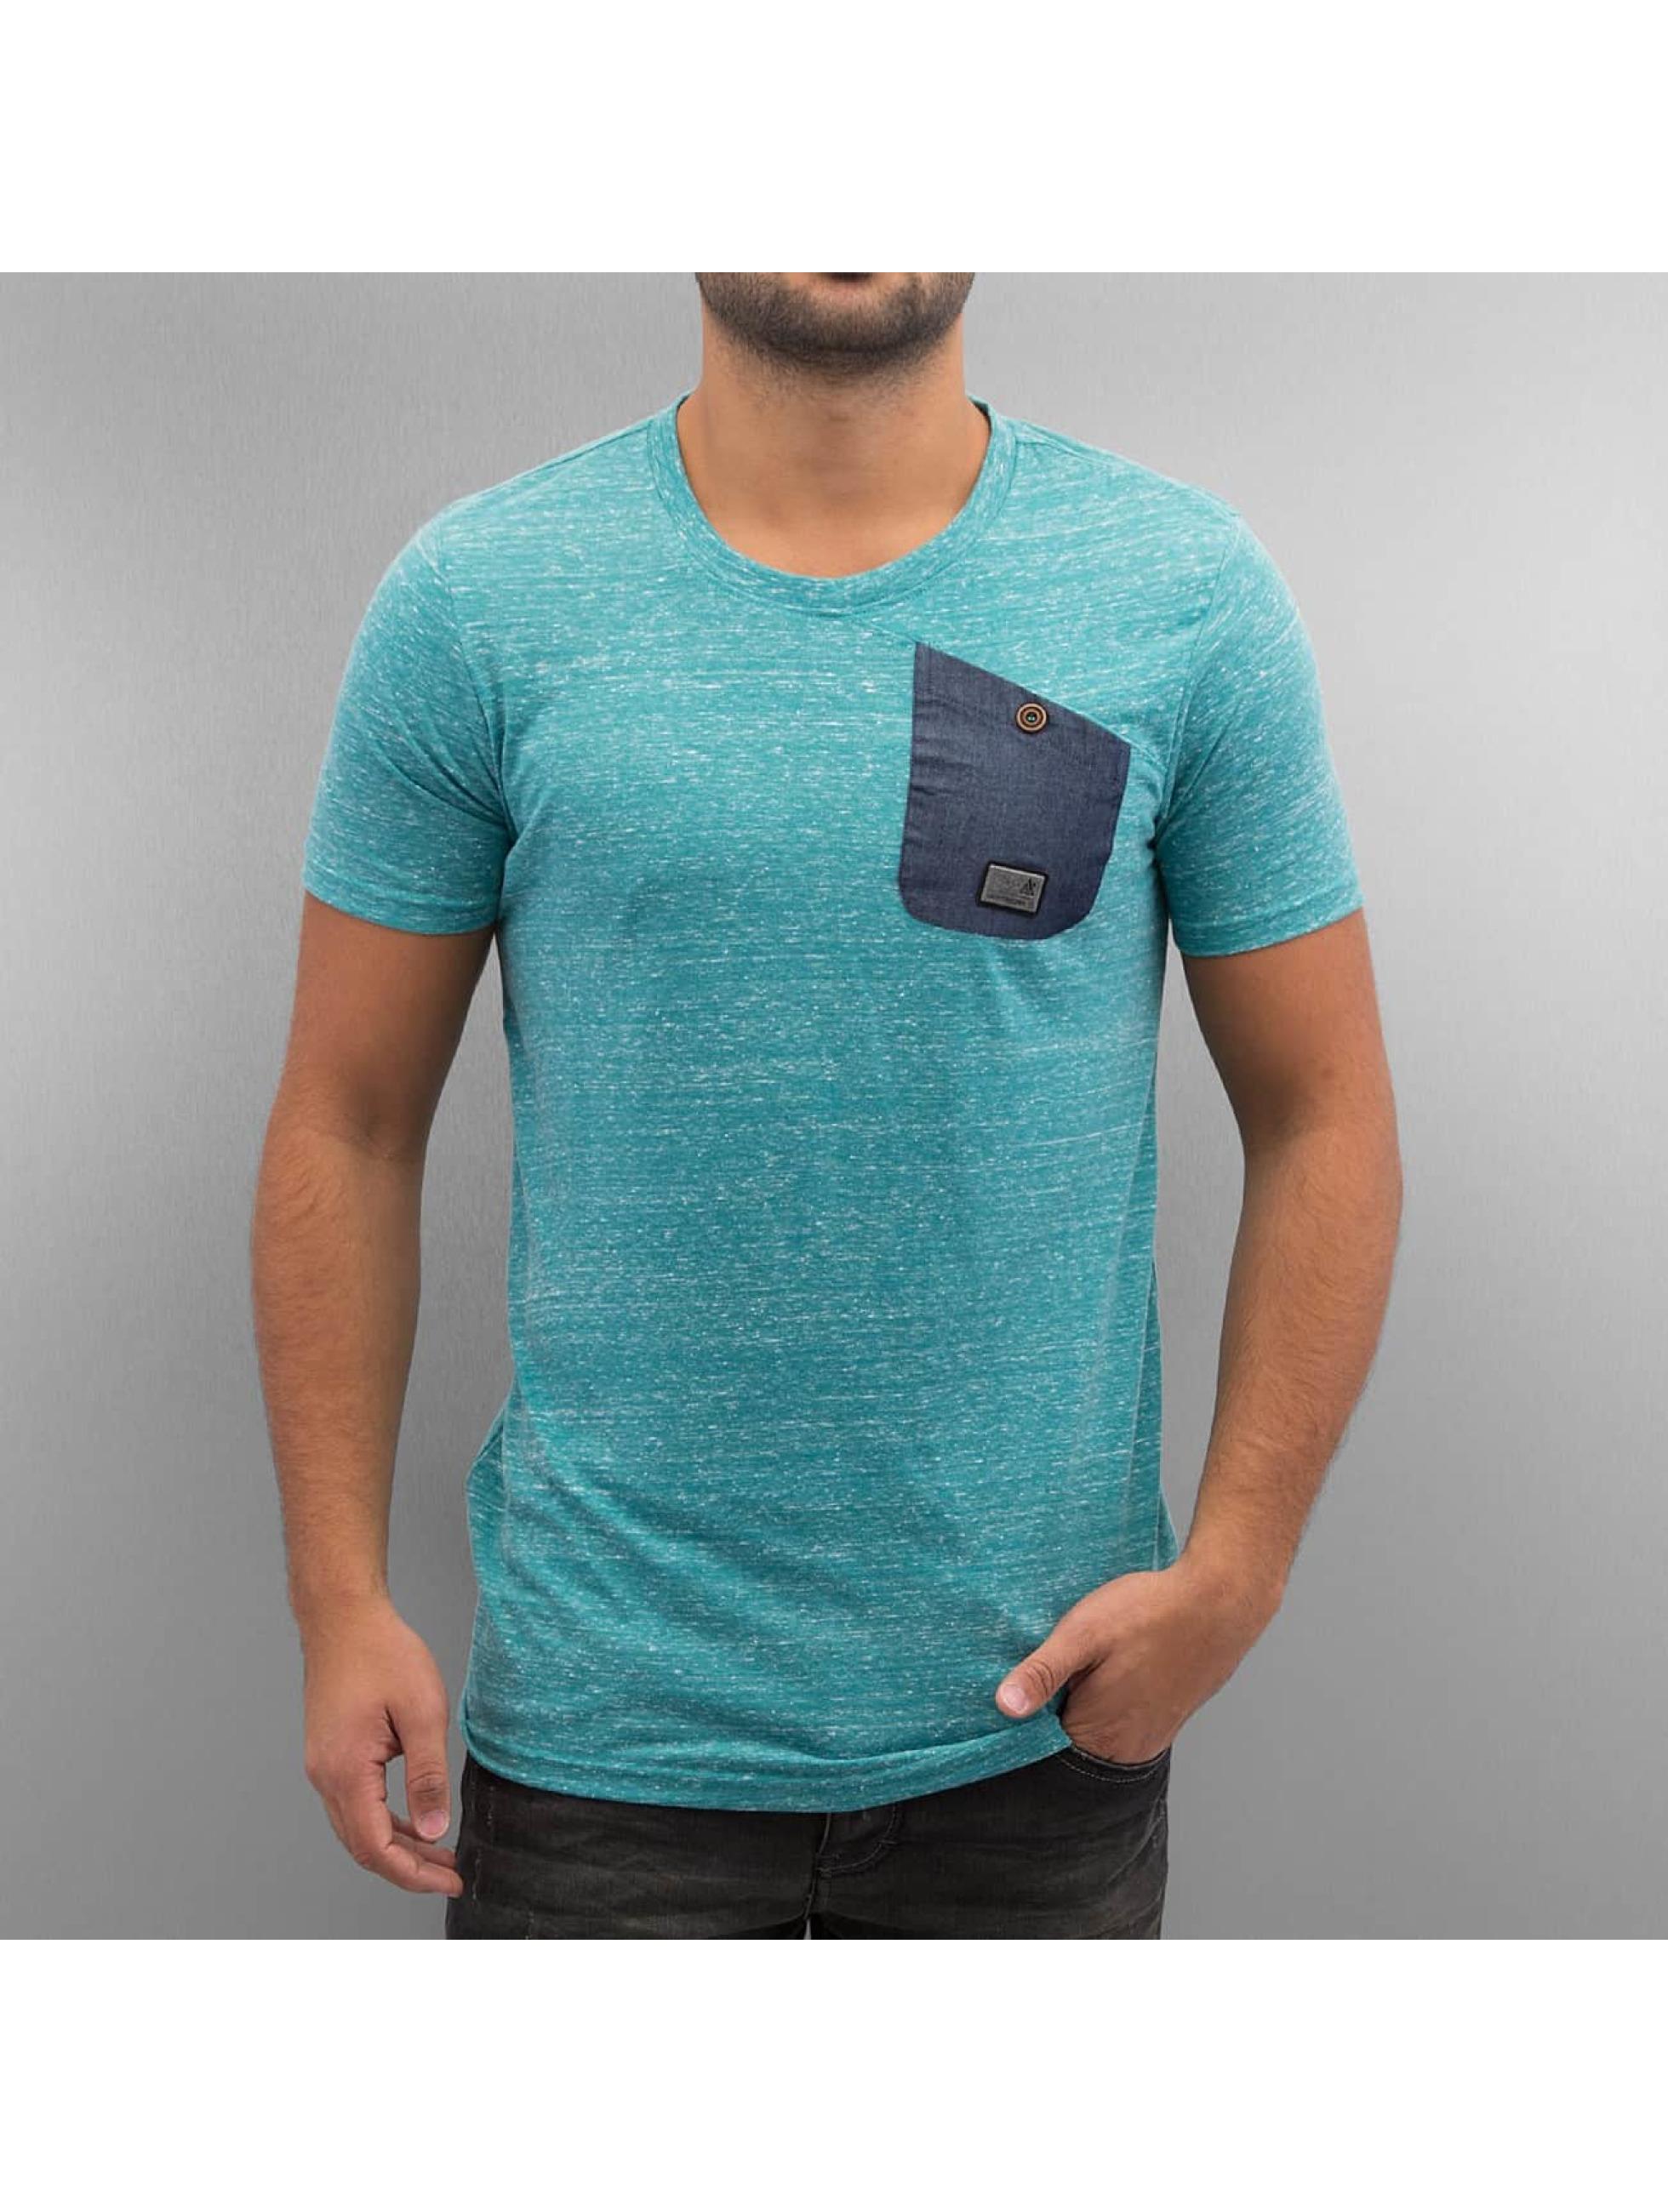 Alife & Kickin T-skjorter Vin A turkis